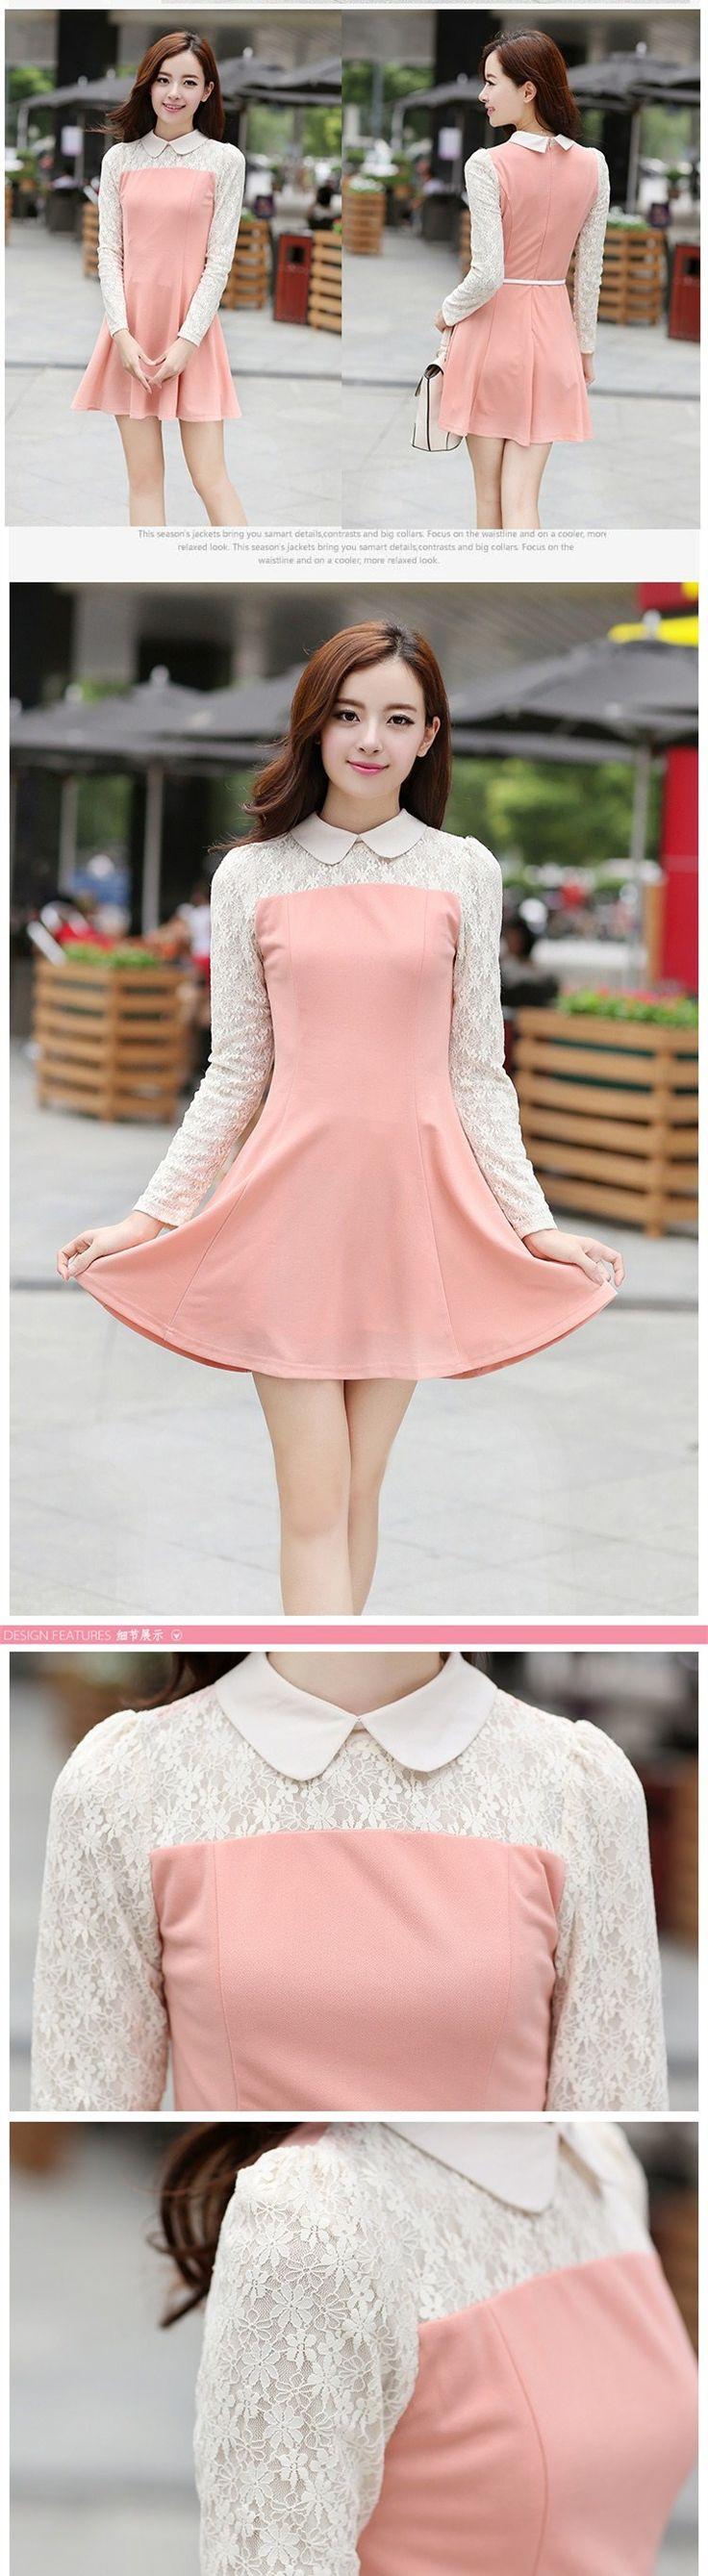 67 best DRESSES images on Pinterest | Curve mini dresses, Dresses ...